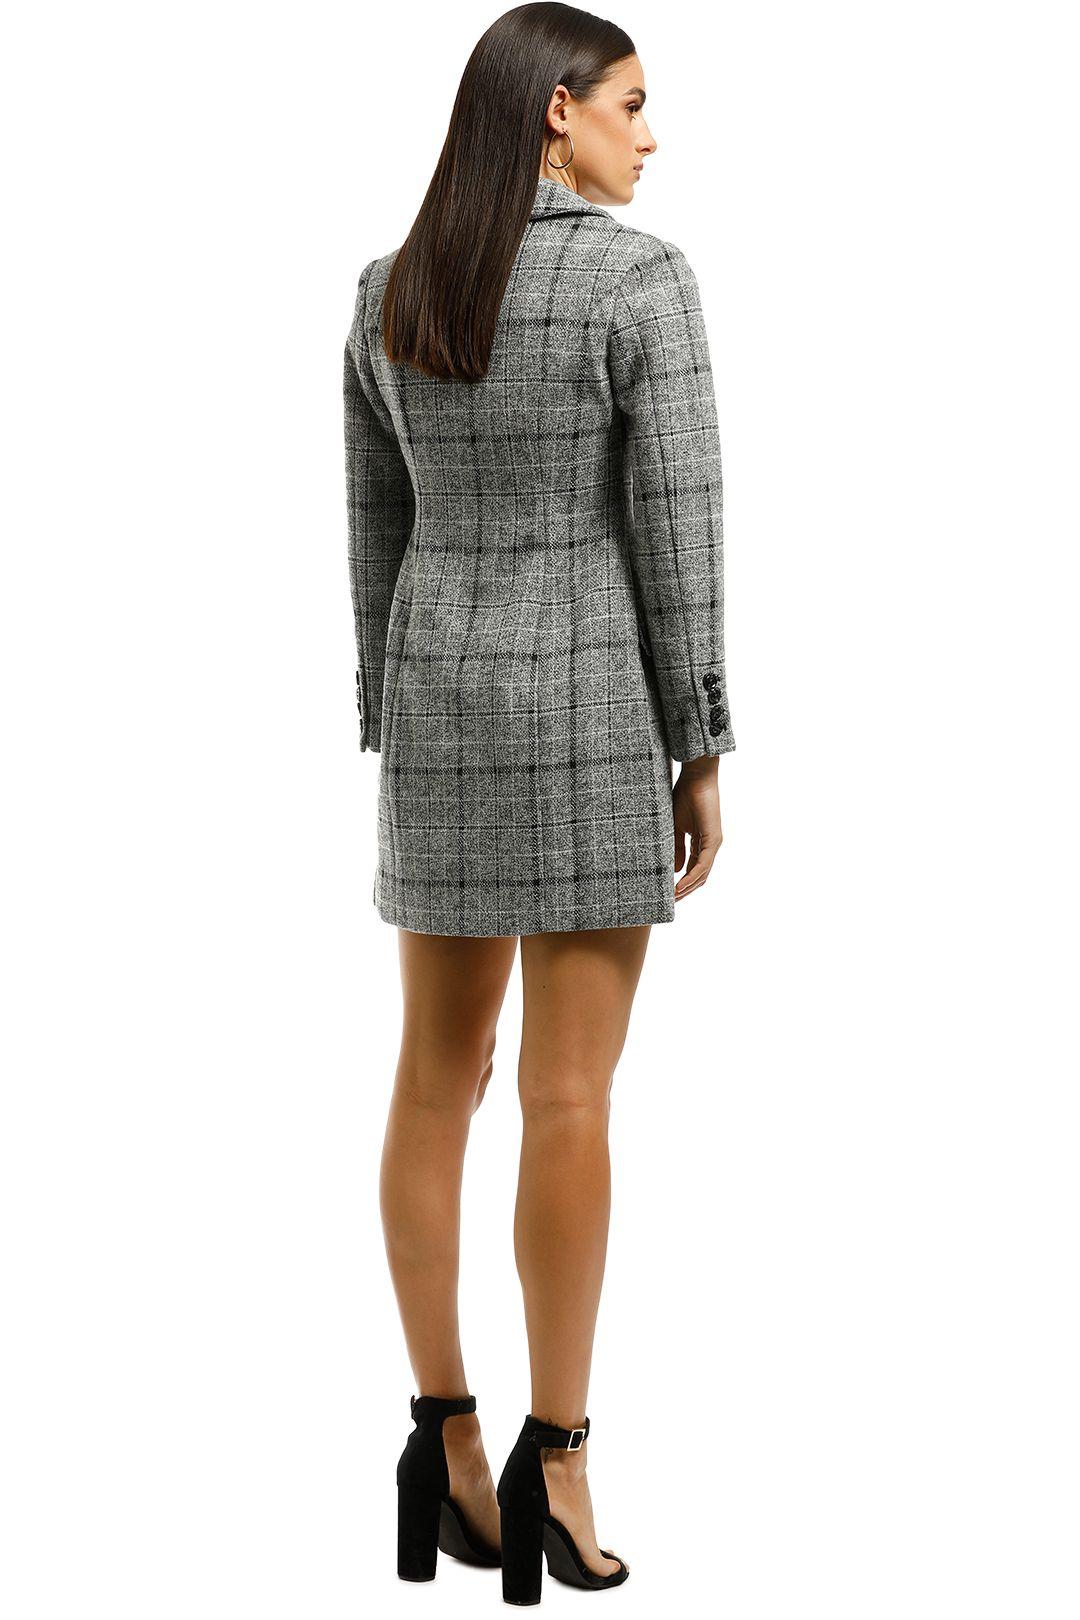 Elliatt-Prato Blazer Dress-Grey-Back